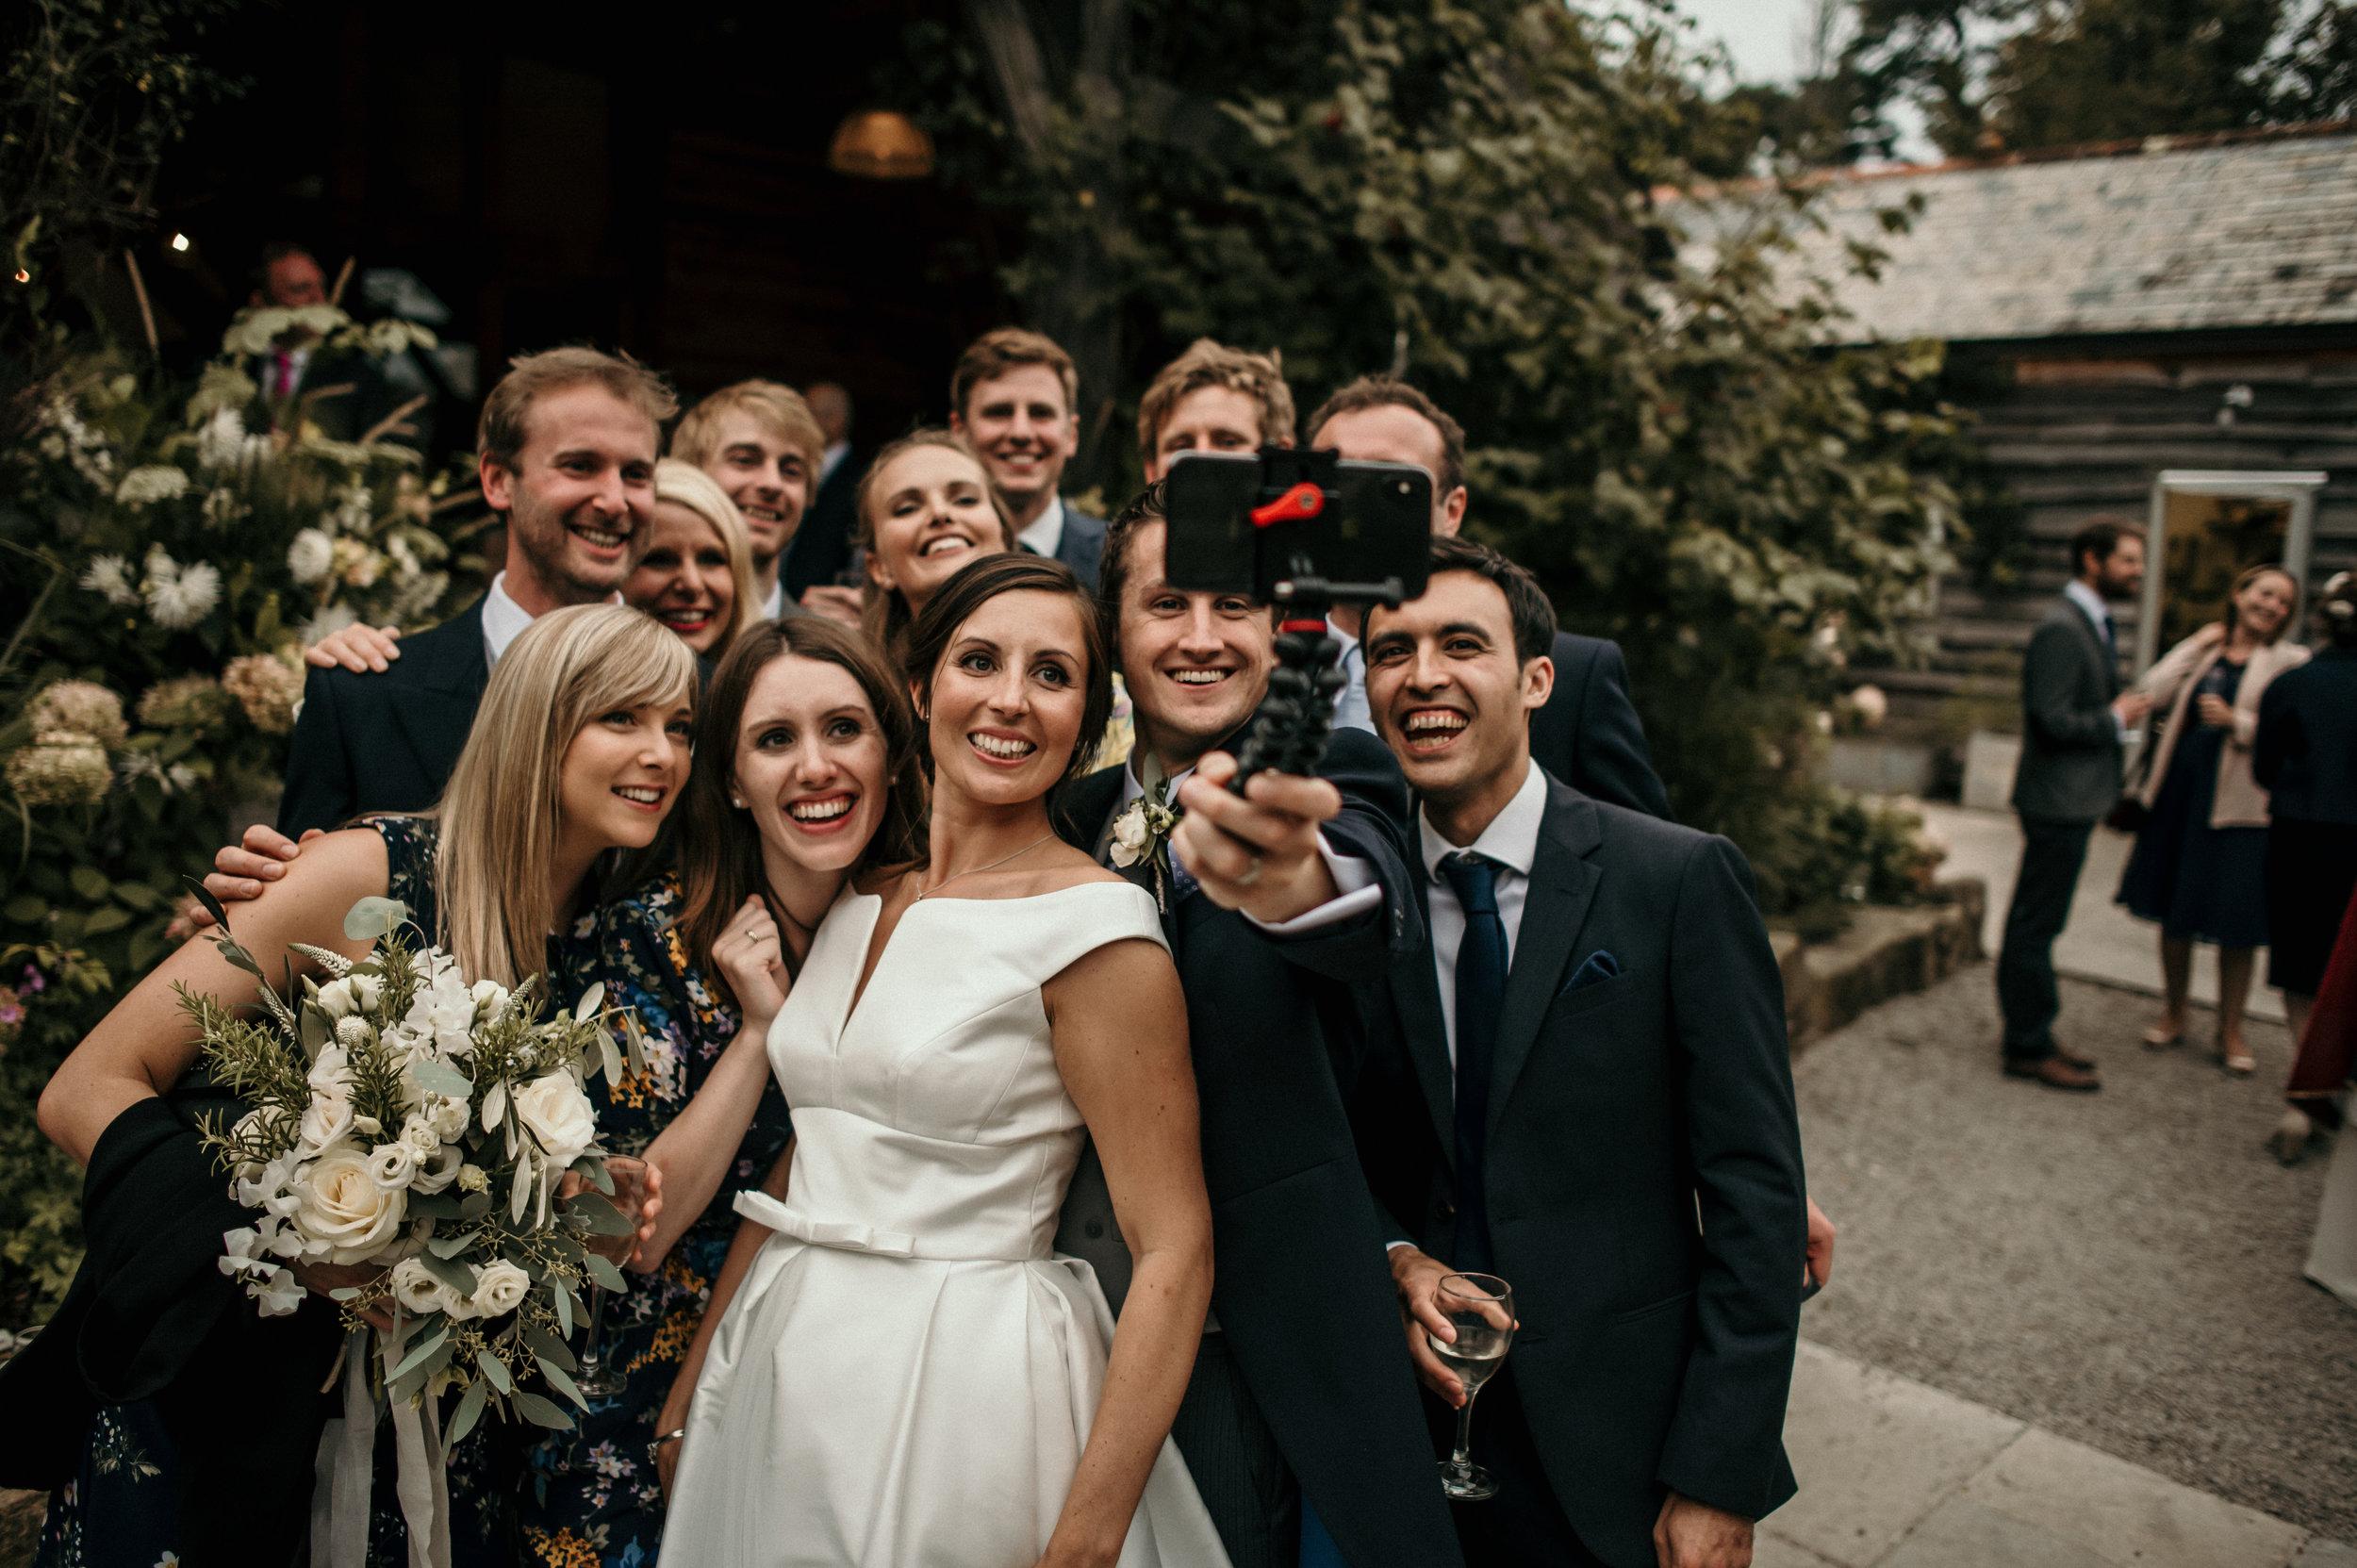 nancarrow-farm-wedding-photographer-cornwall-51.jpg